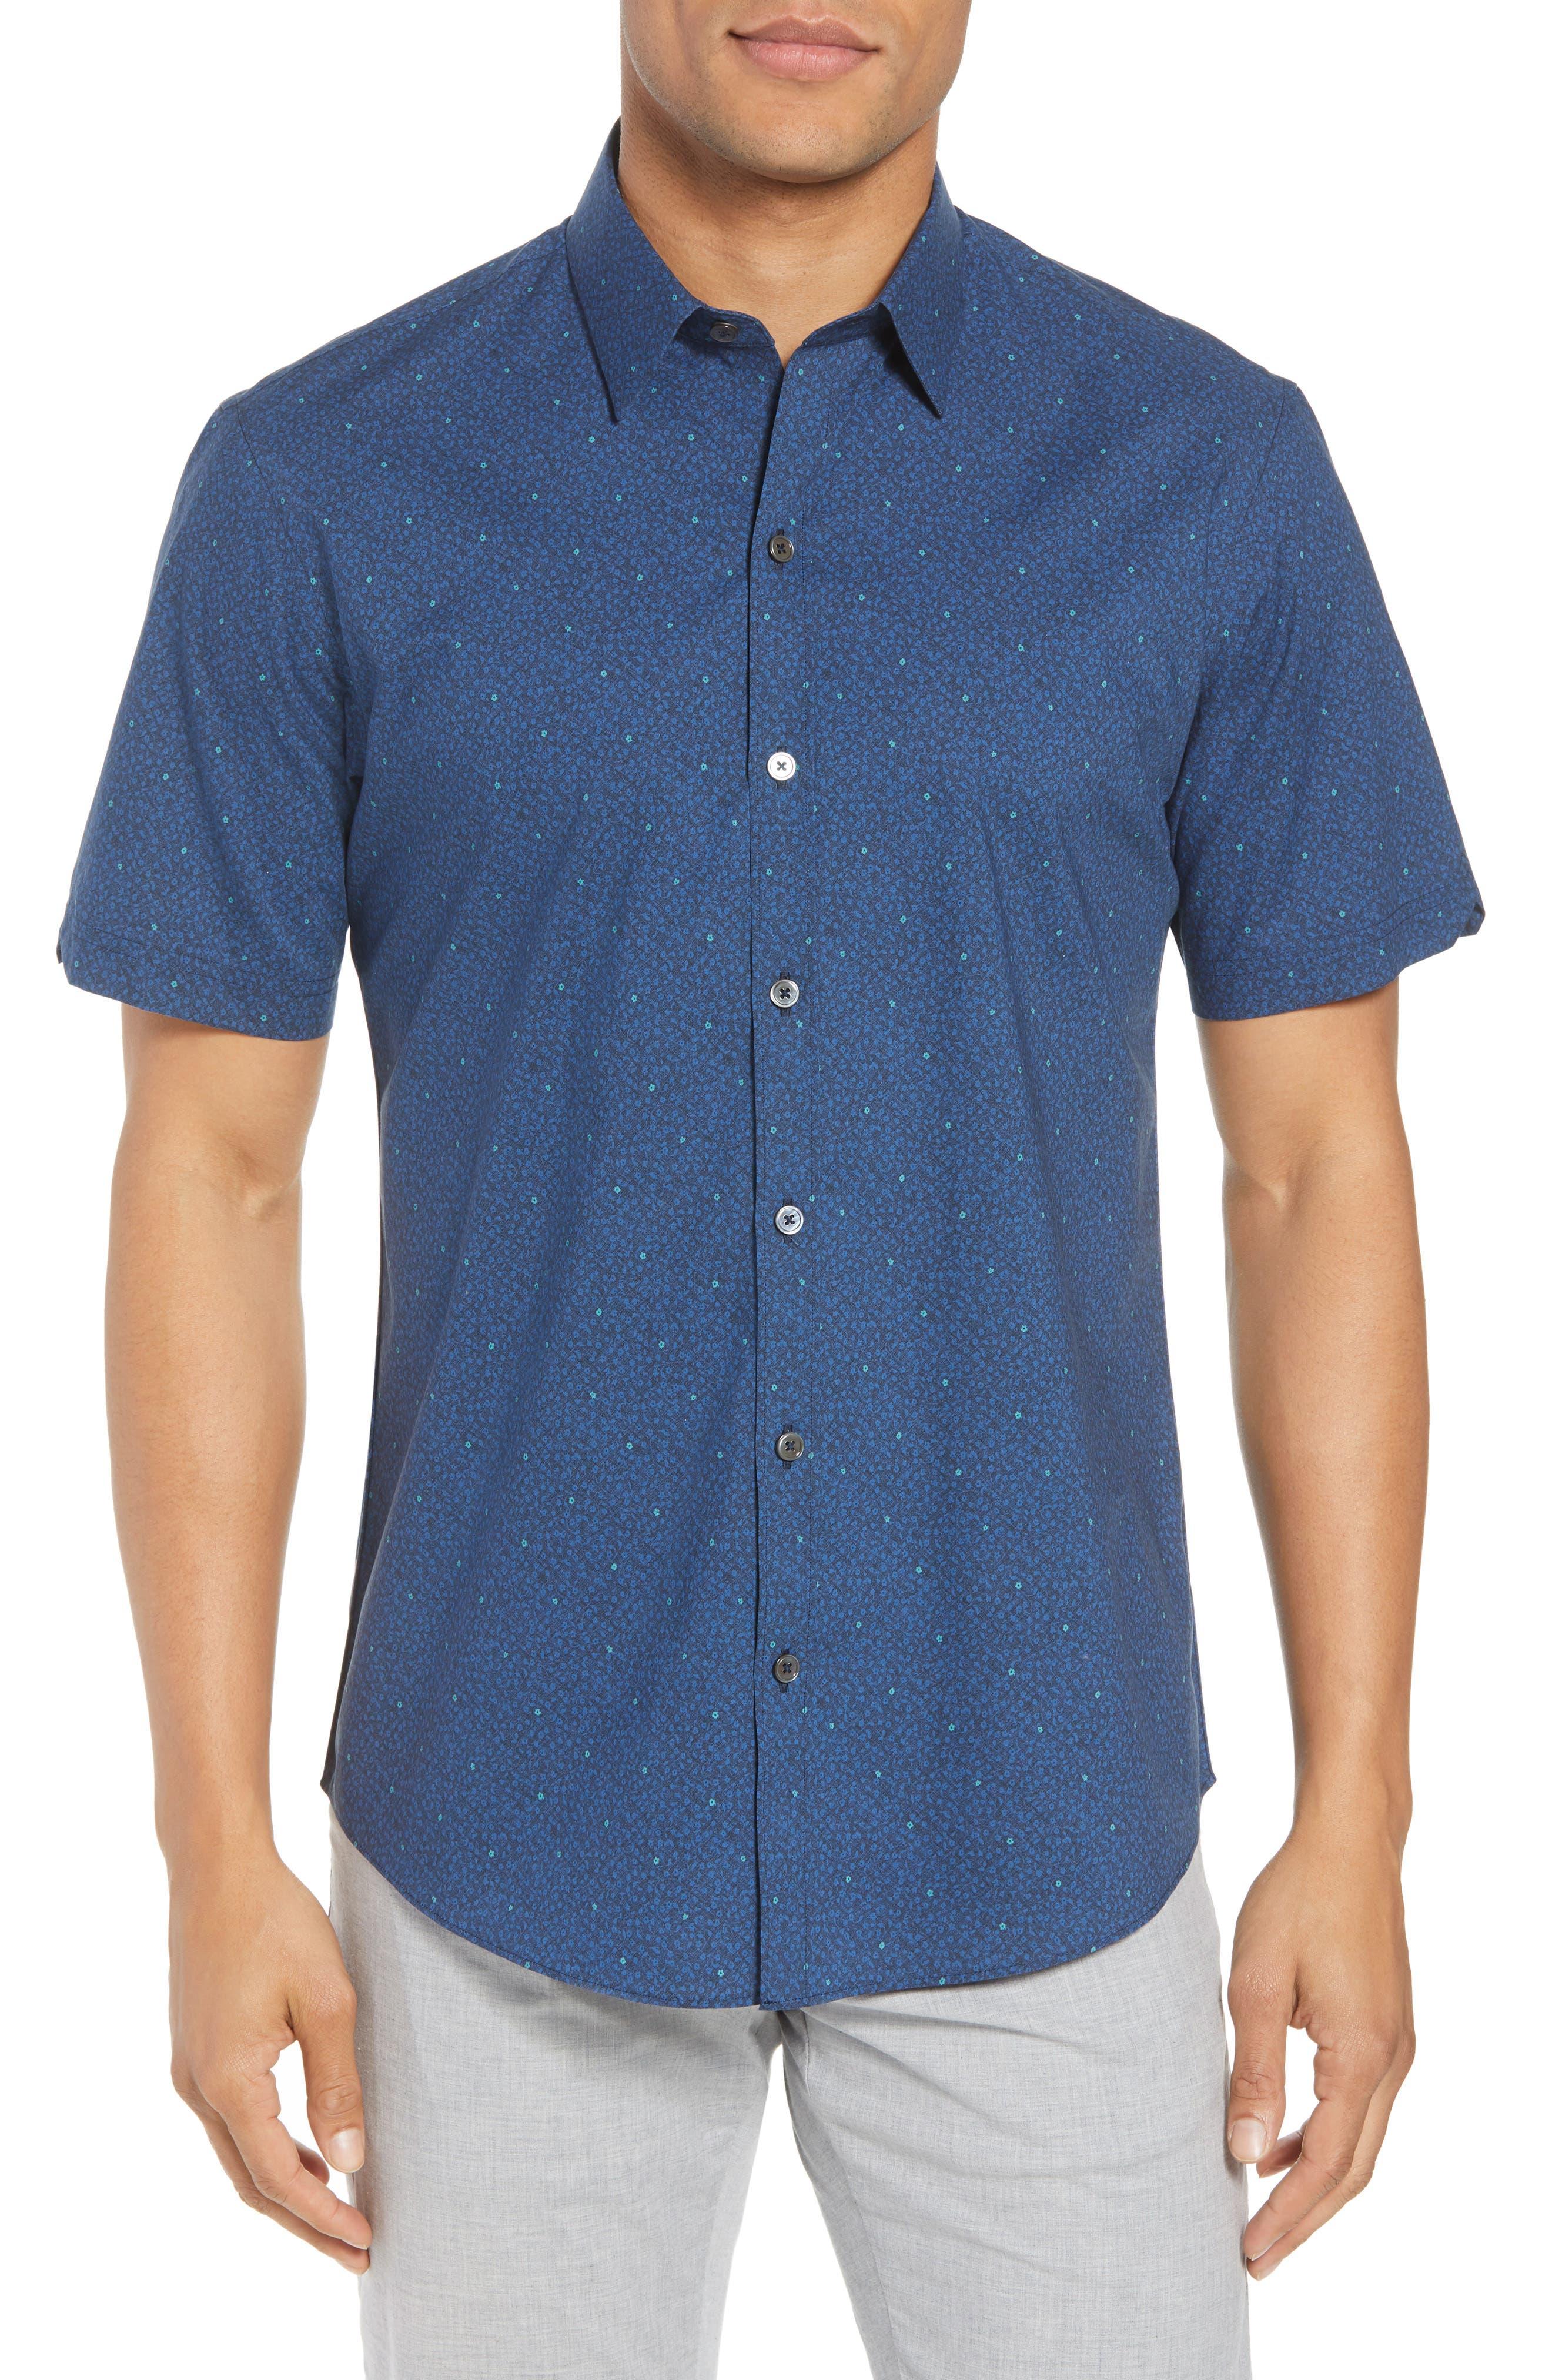 Wichert Trim Fit Floral Print Sport Shirt,                             Main thumbnail 1, color,                             Dark Blue